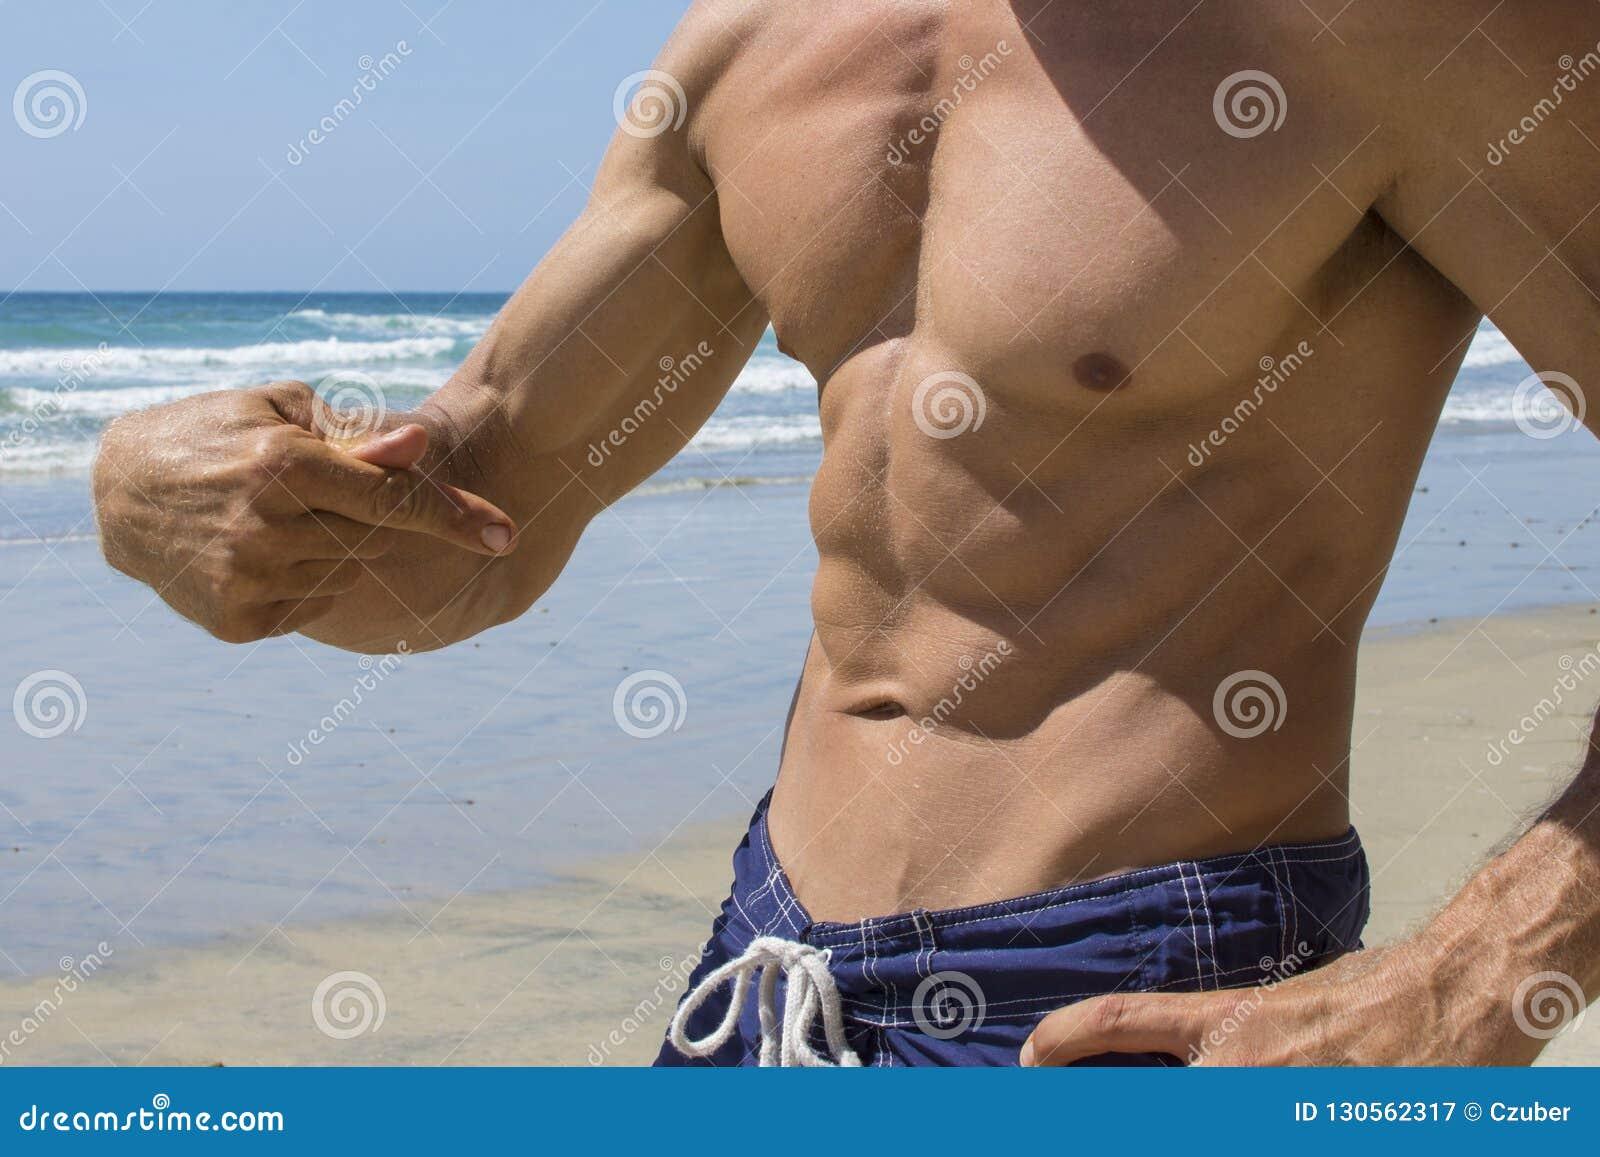 Abs masculino natural da praia